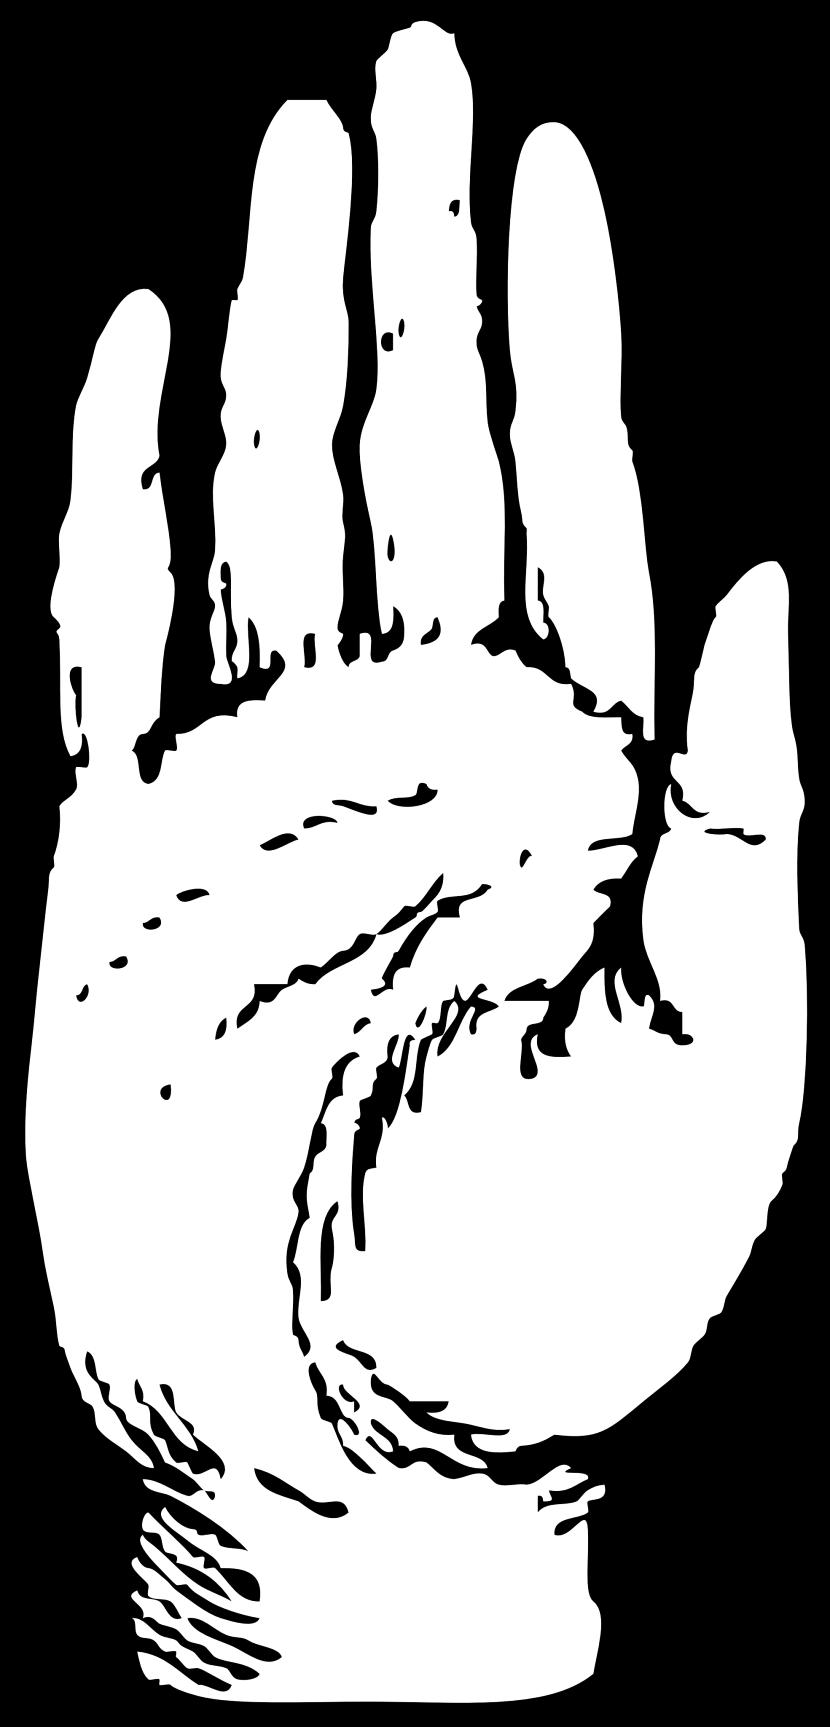 collection of pledge. Handprint clipart volunteer hand